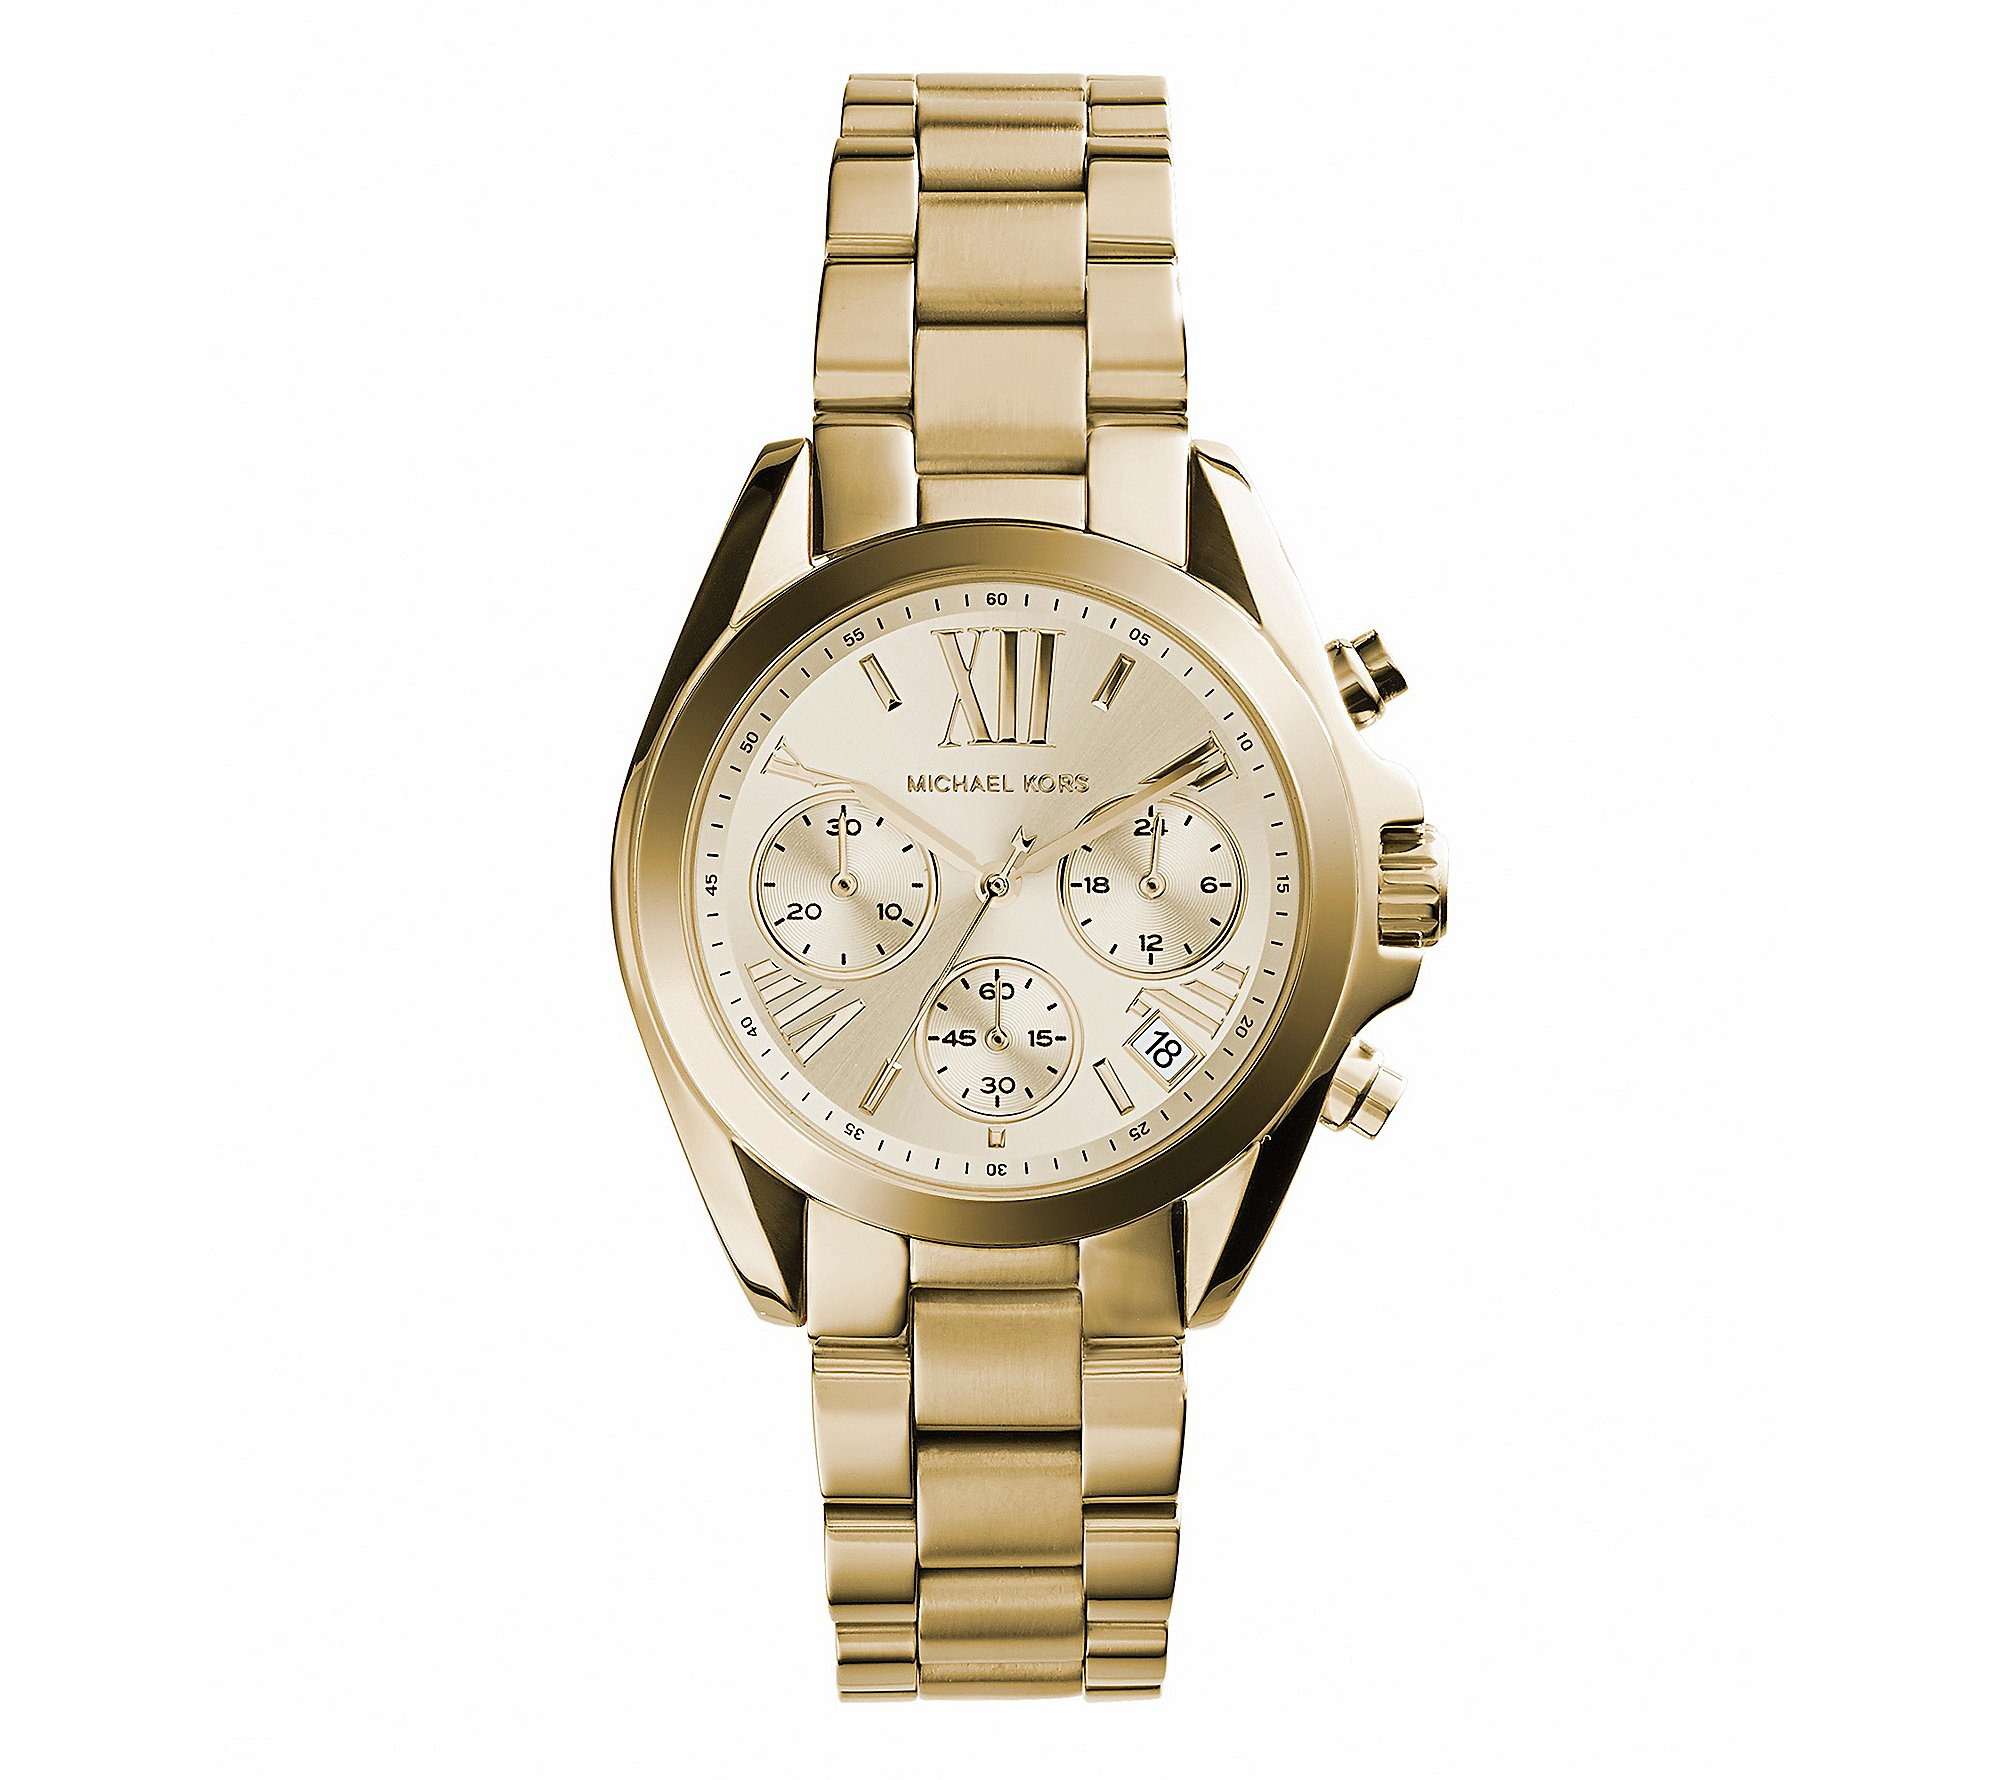 Michael Kors Women's Bradshaw Watch, Gold, One Size